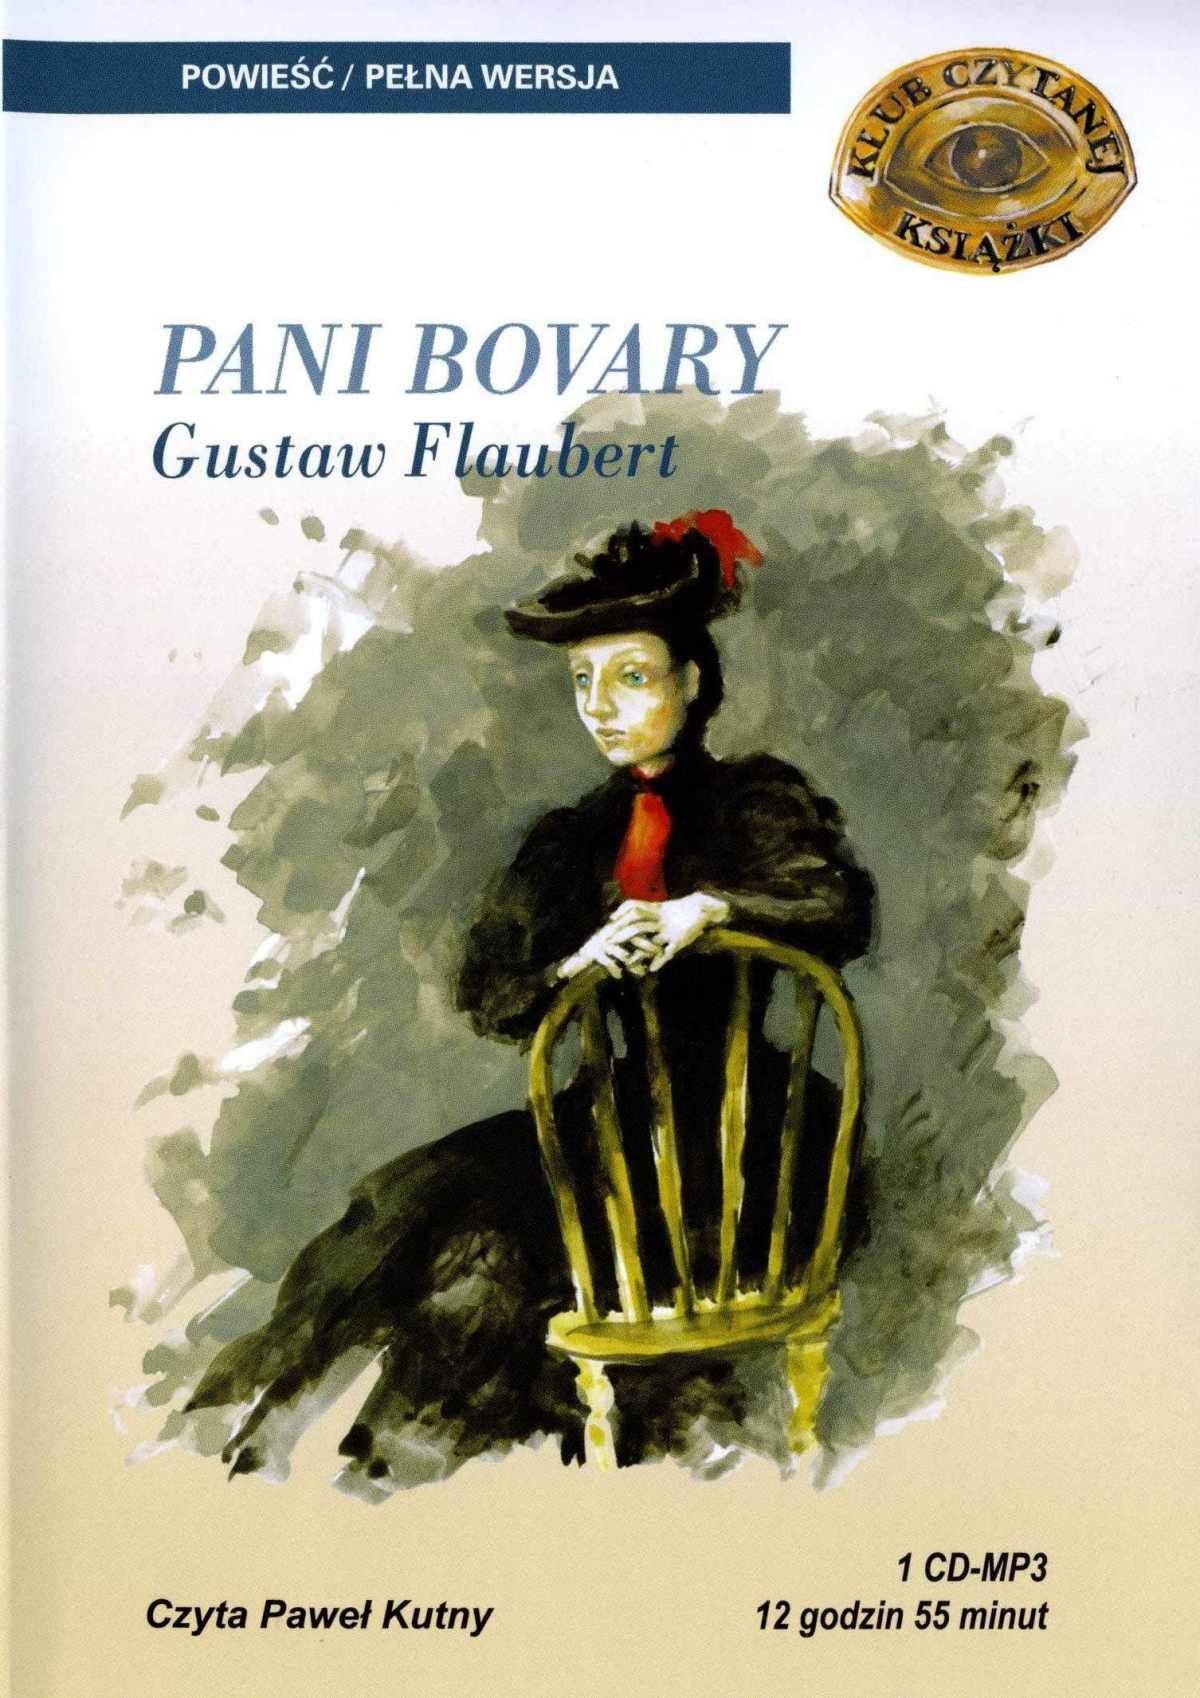 FLAUBERT GUSTAW – PANI BOVARY